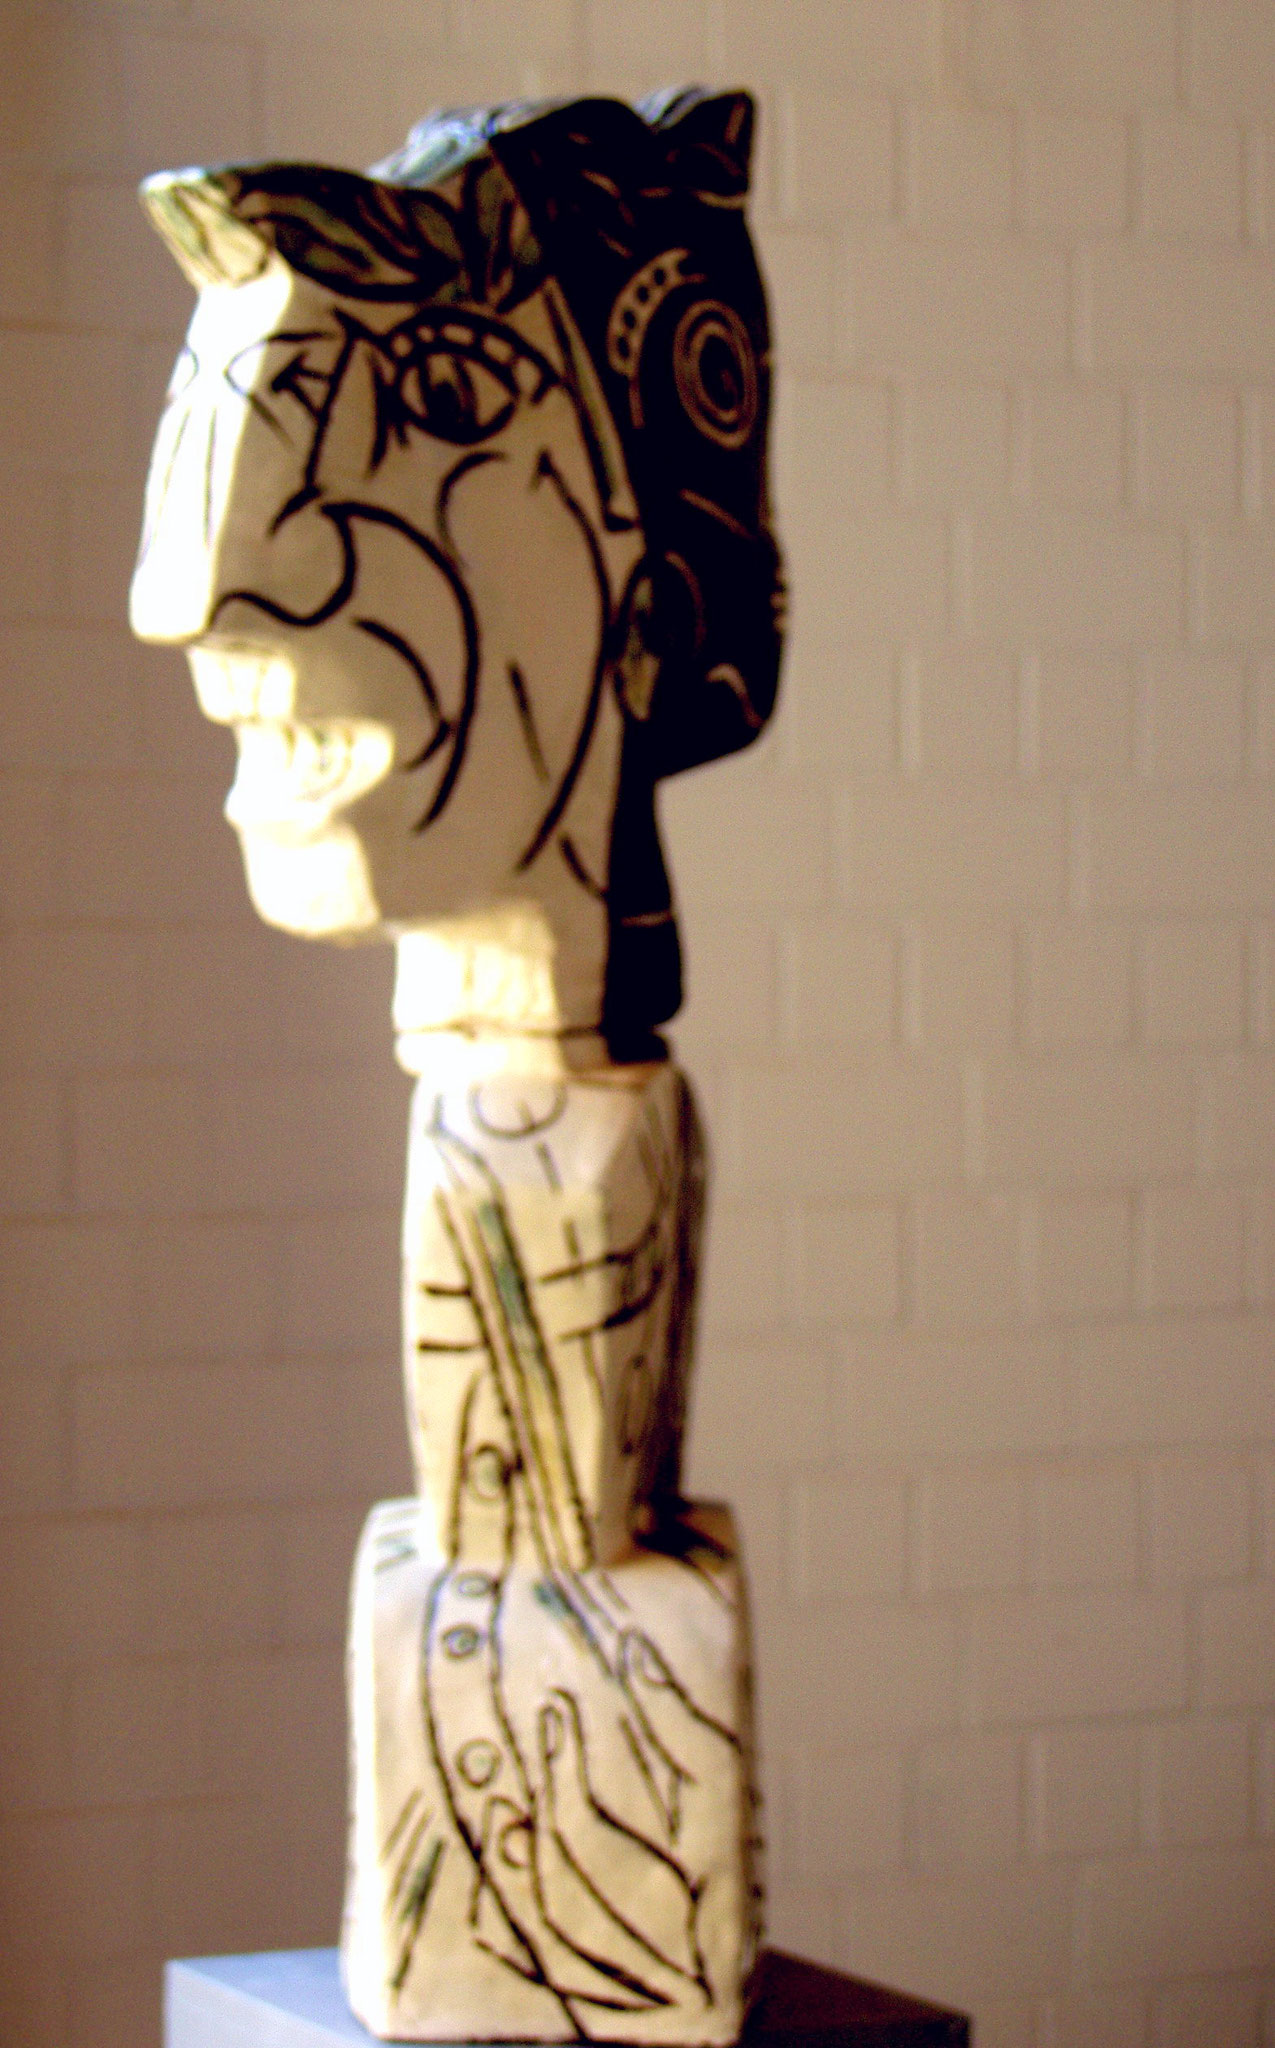 Orpheus blickt zurück, weißer Ton bemalt,  Höhe = 105 cm